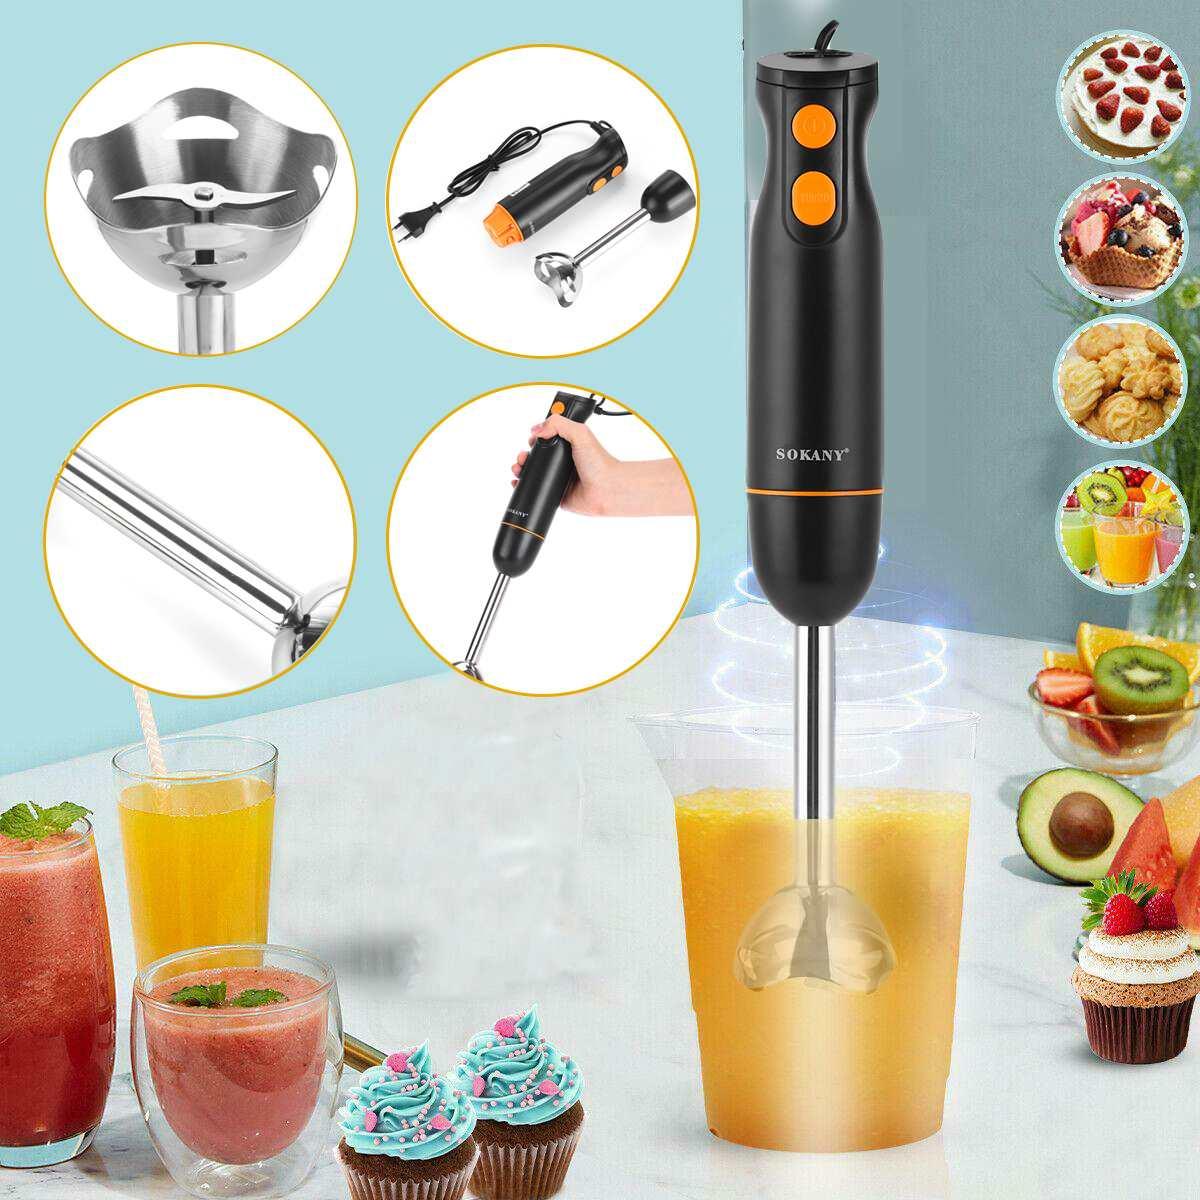 2Speed Hand Blender Electric Food Blender Mixer Kitchen Detachable Hand Food supplement machine Egg Beater Vegetable Stand Blend